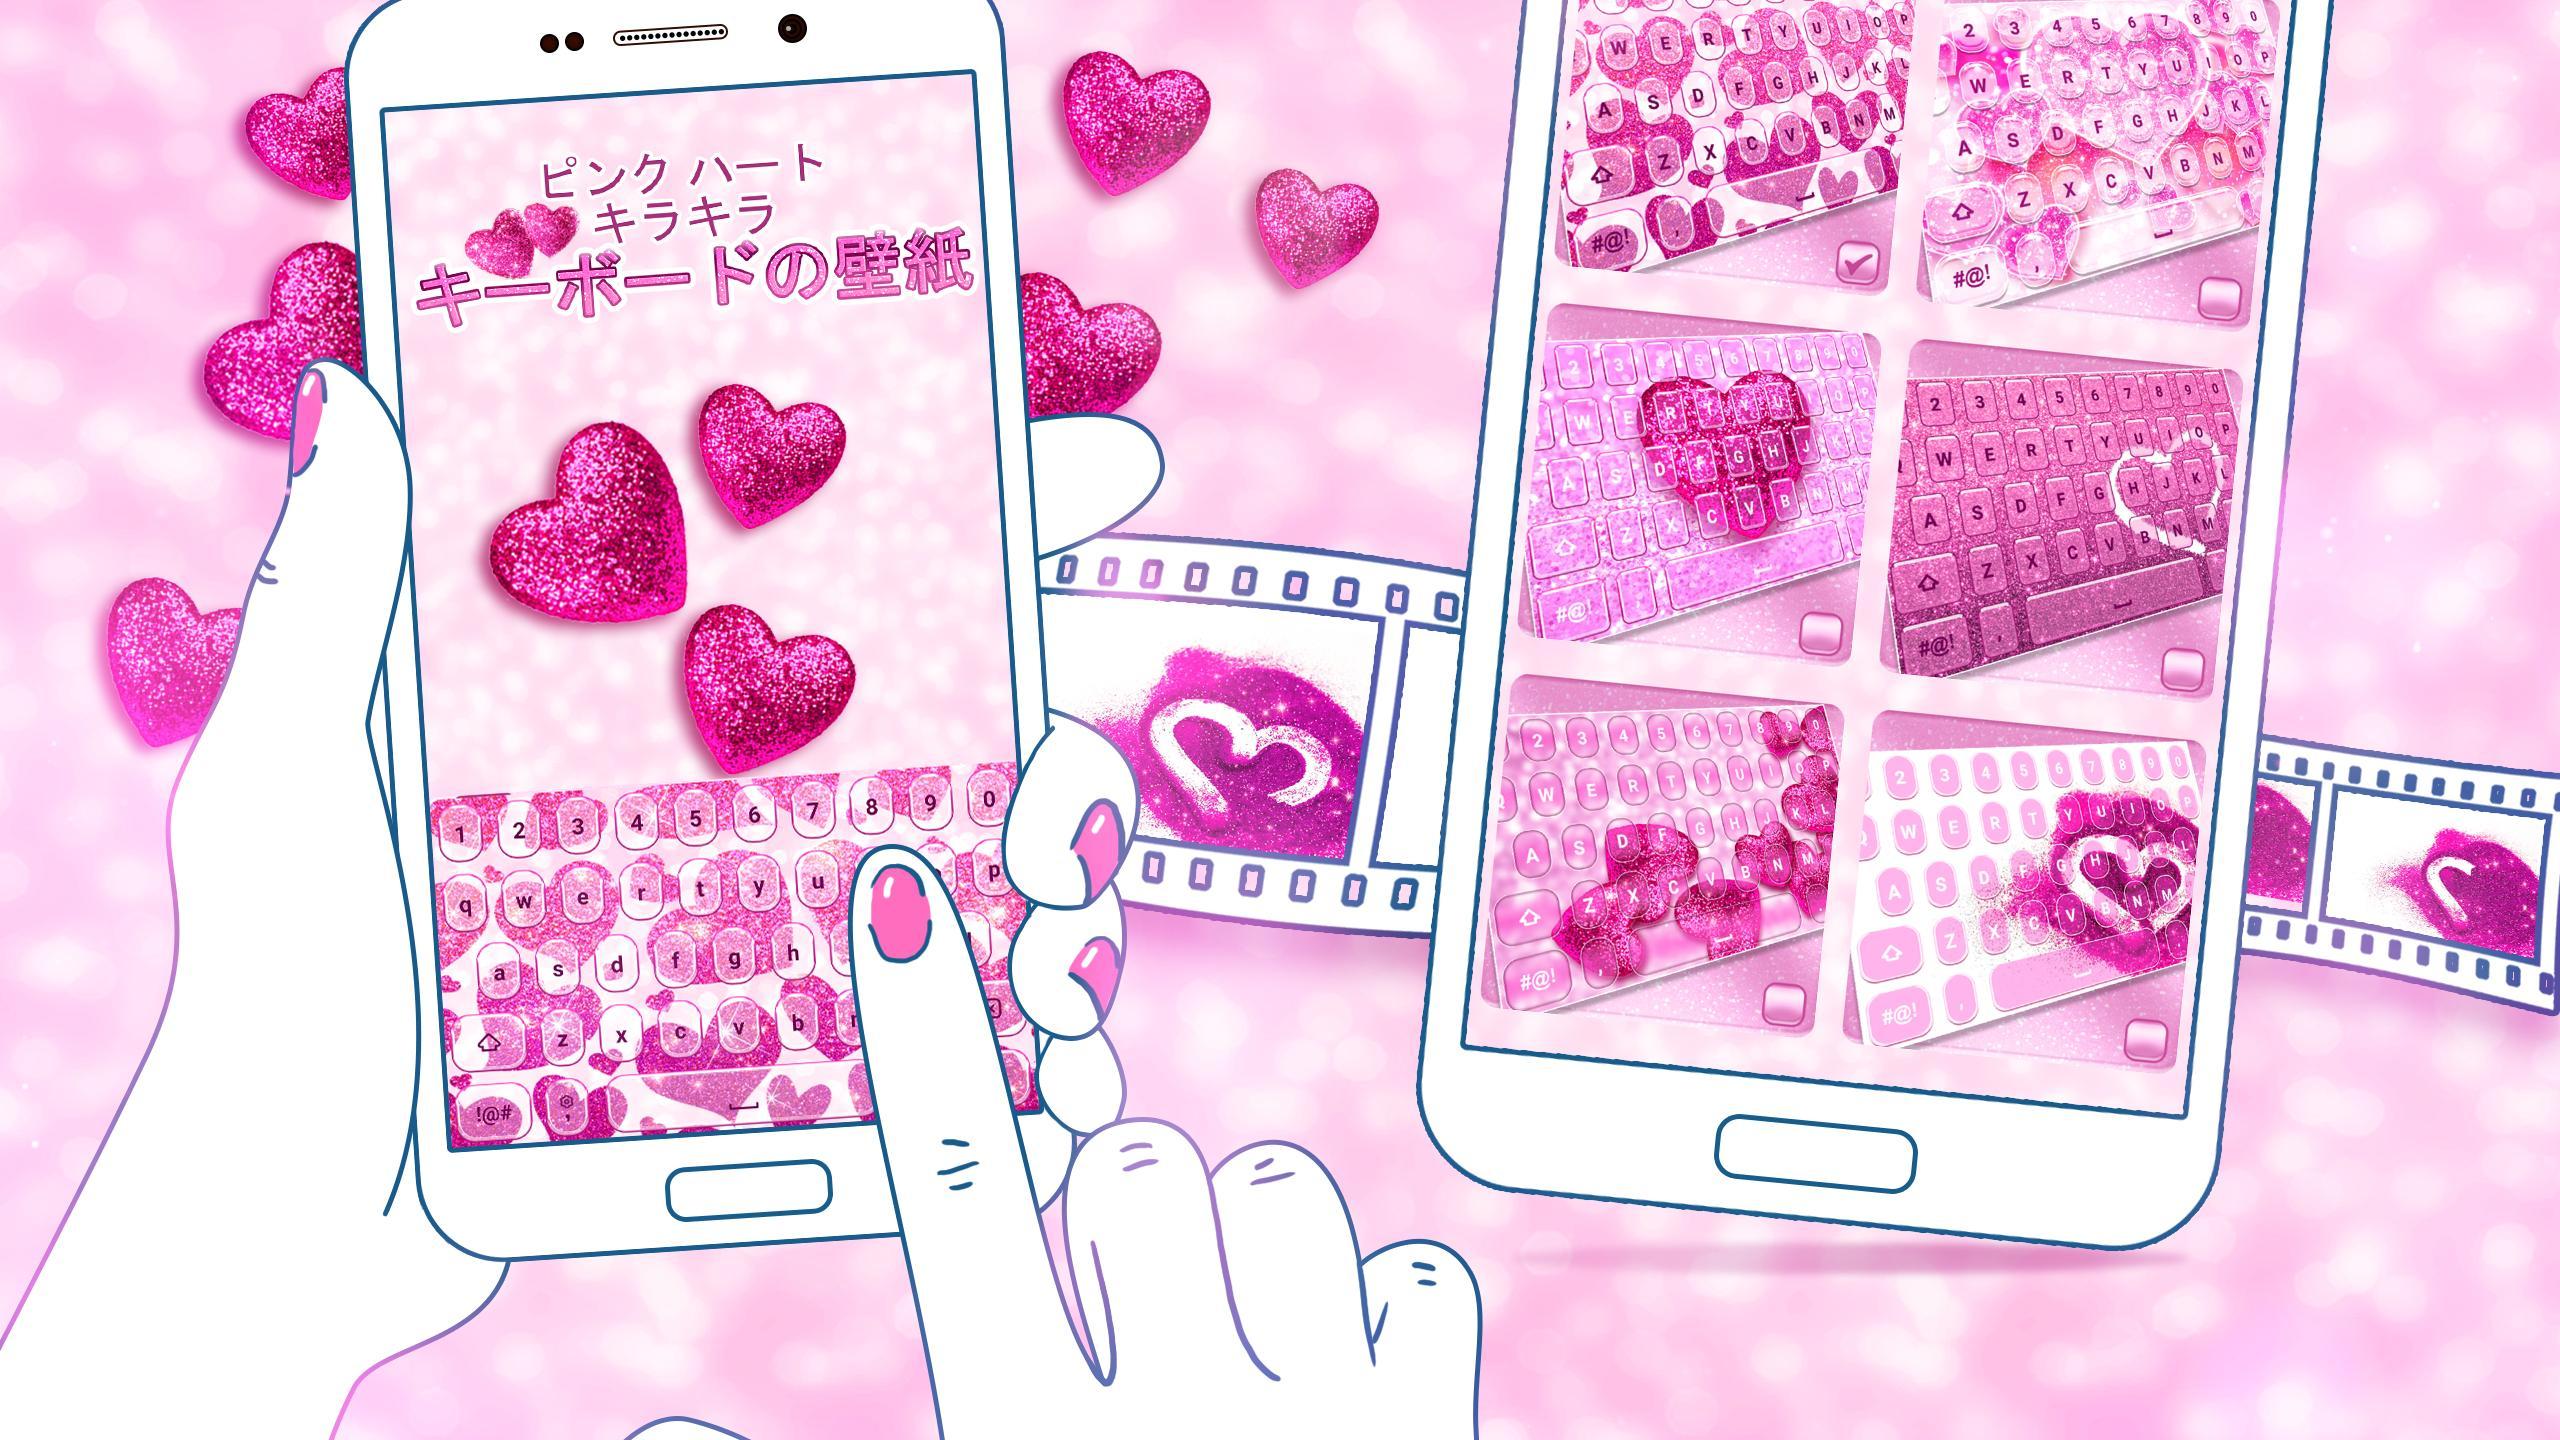 Android 用の ピンク ハート キラキラ キーボードの壁紙 Apk を